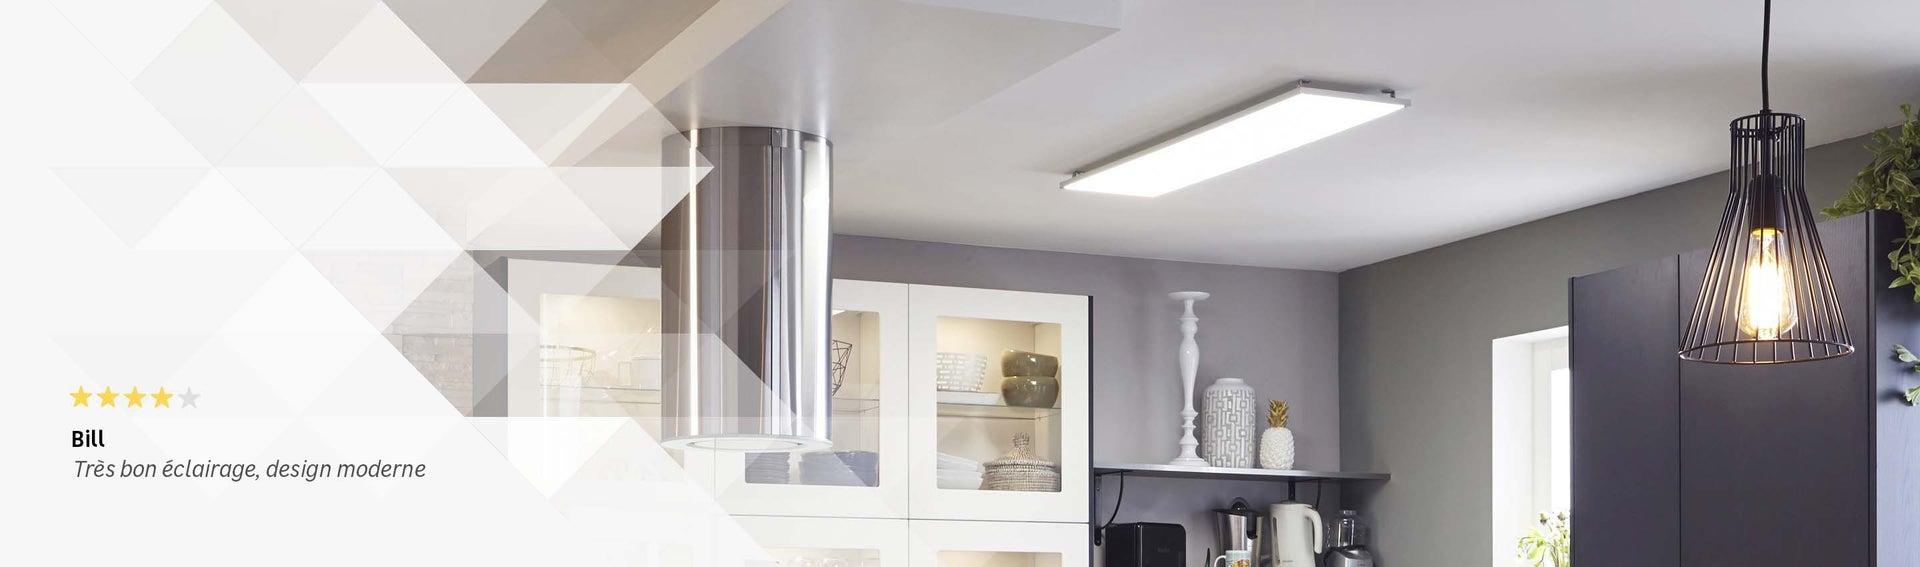 Luminaire int rieur design leroy merlin for Pot design interieur